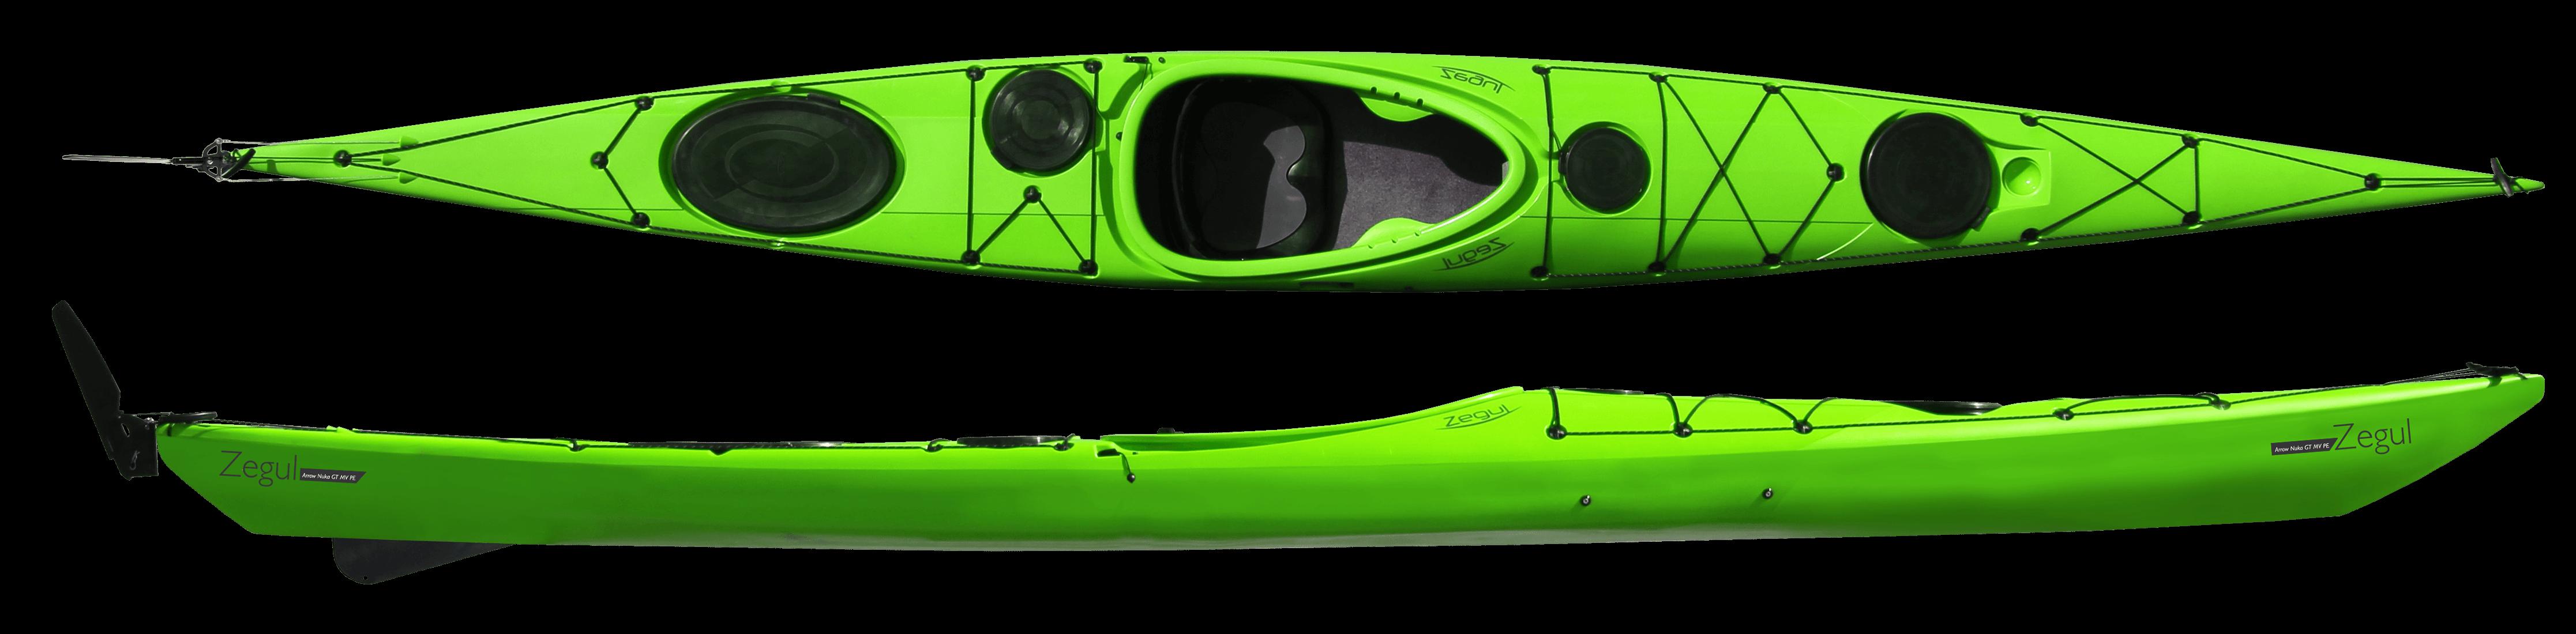 Zegul Nuka GT MV Kajak.Store